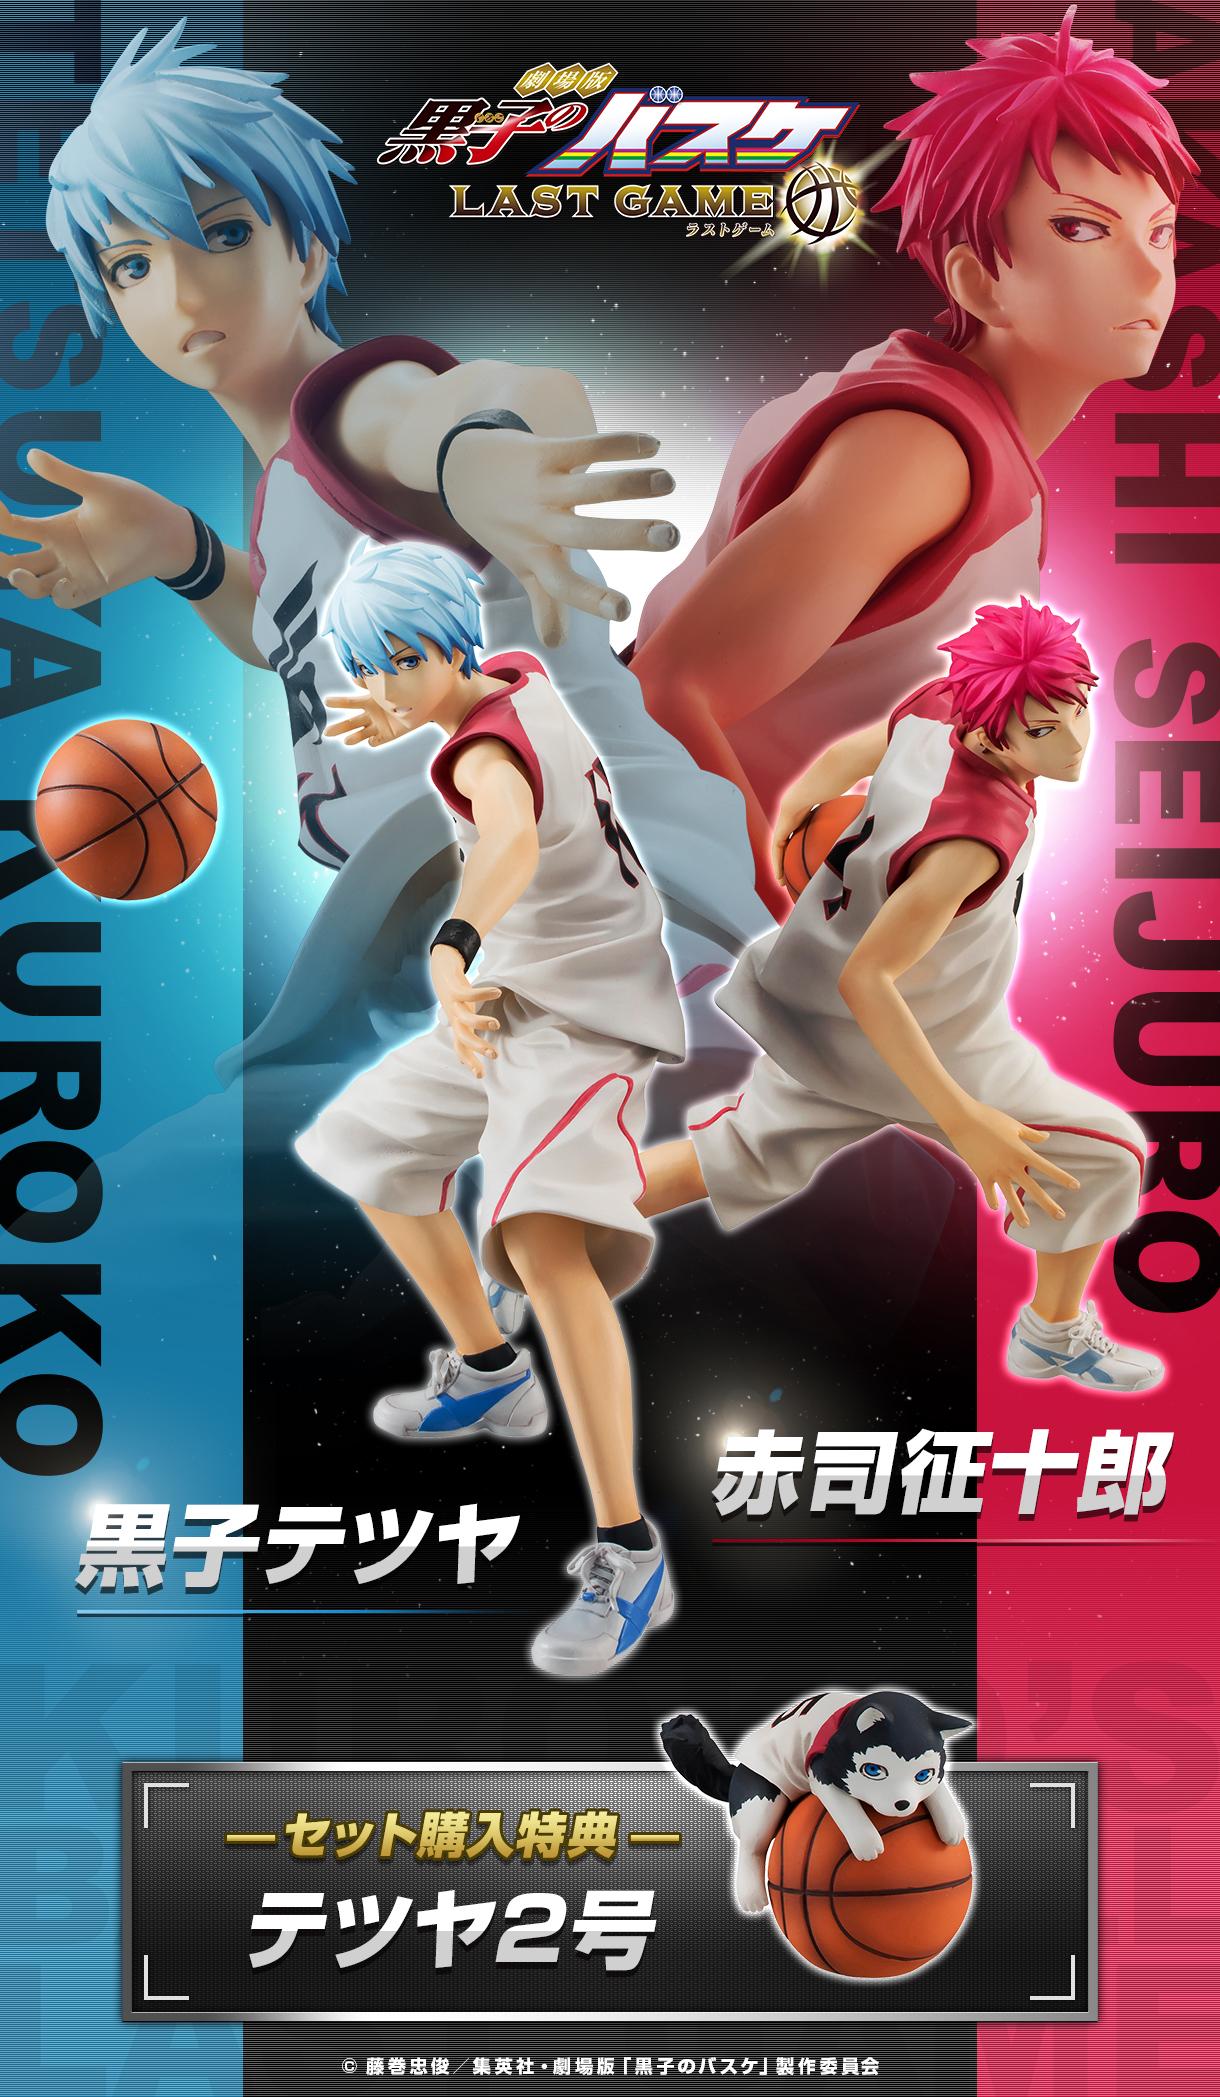 Kuroko Tetsuya & Akashi Seijuurou (Limited + Exclusive) – Gekijouban Kuroko no Basket Last Game